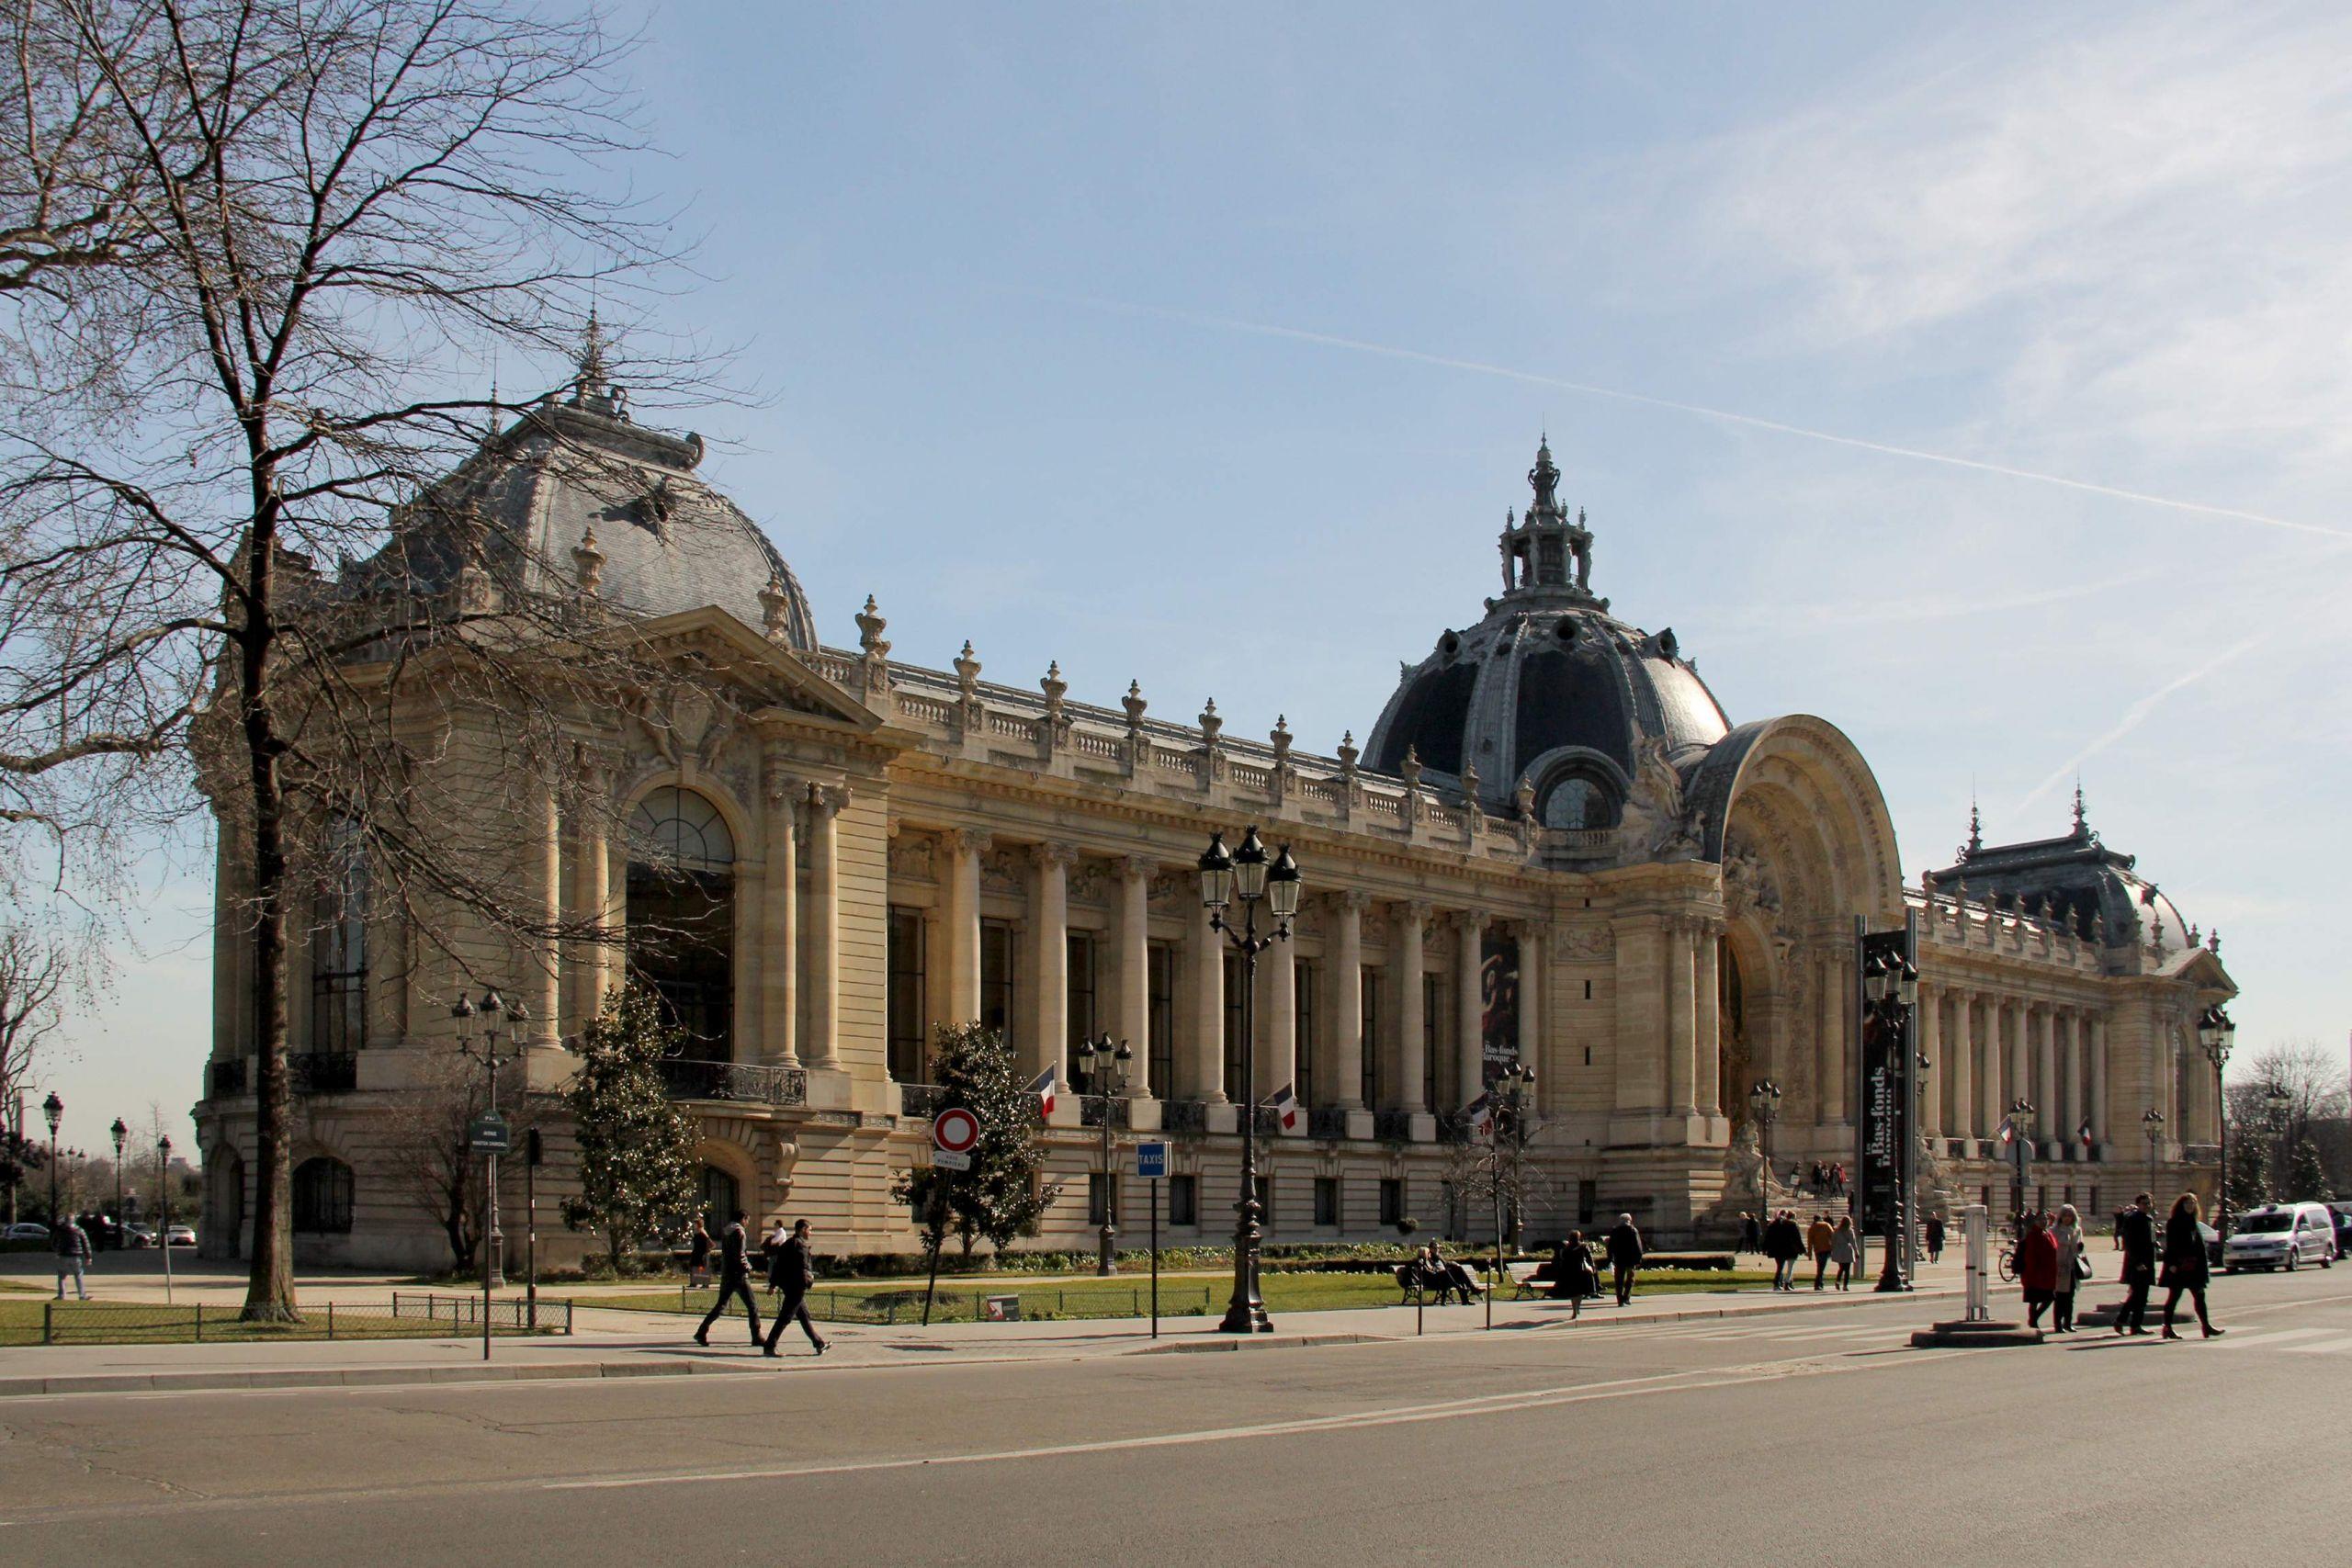 Facade of Petit Palais Paris 6 March 2015